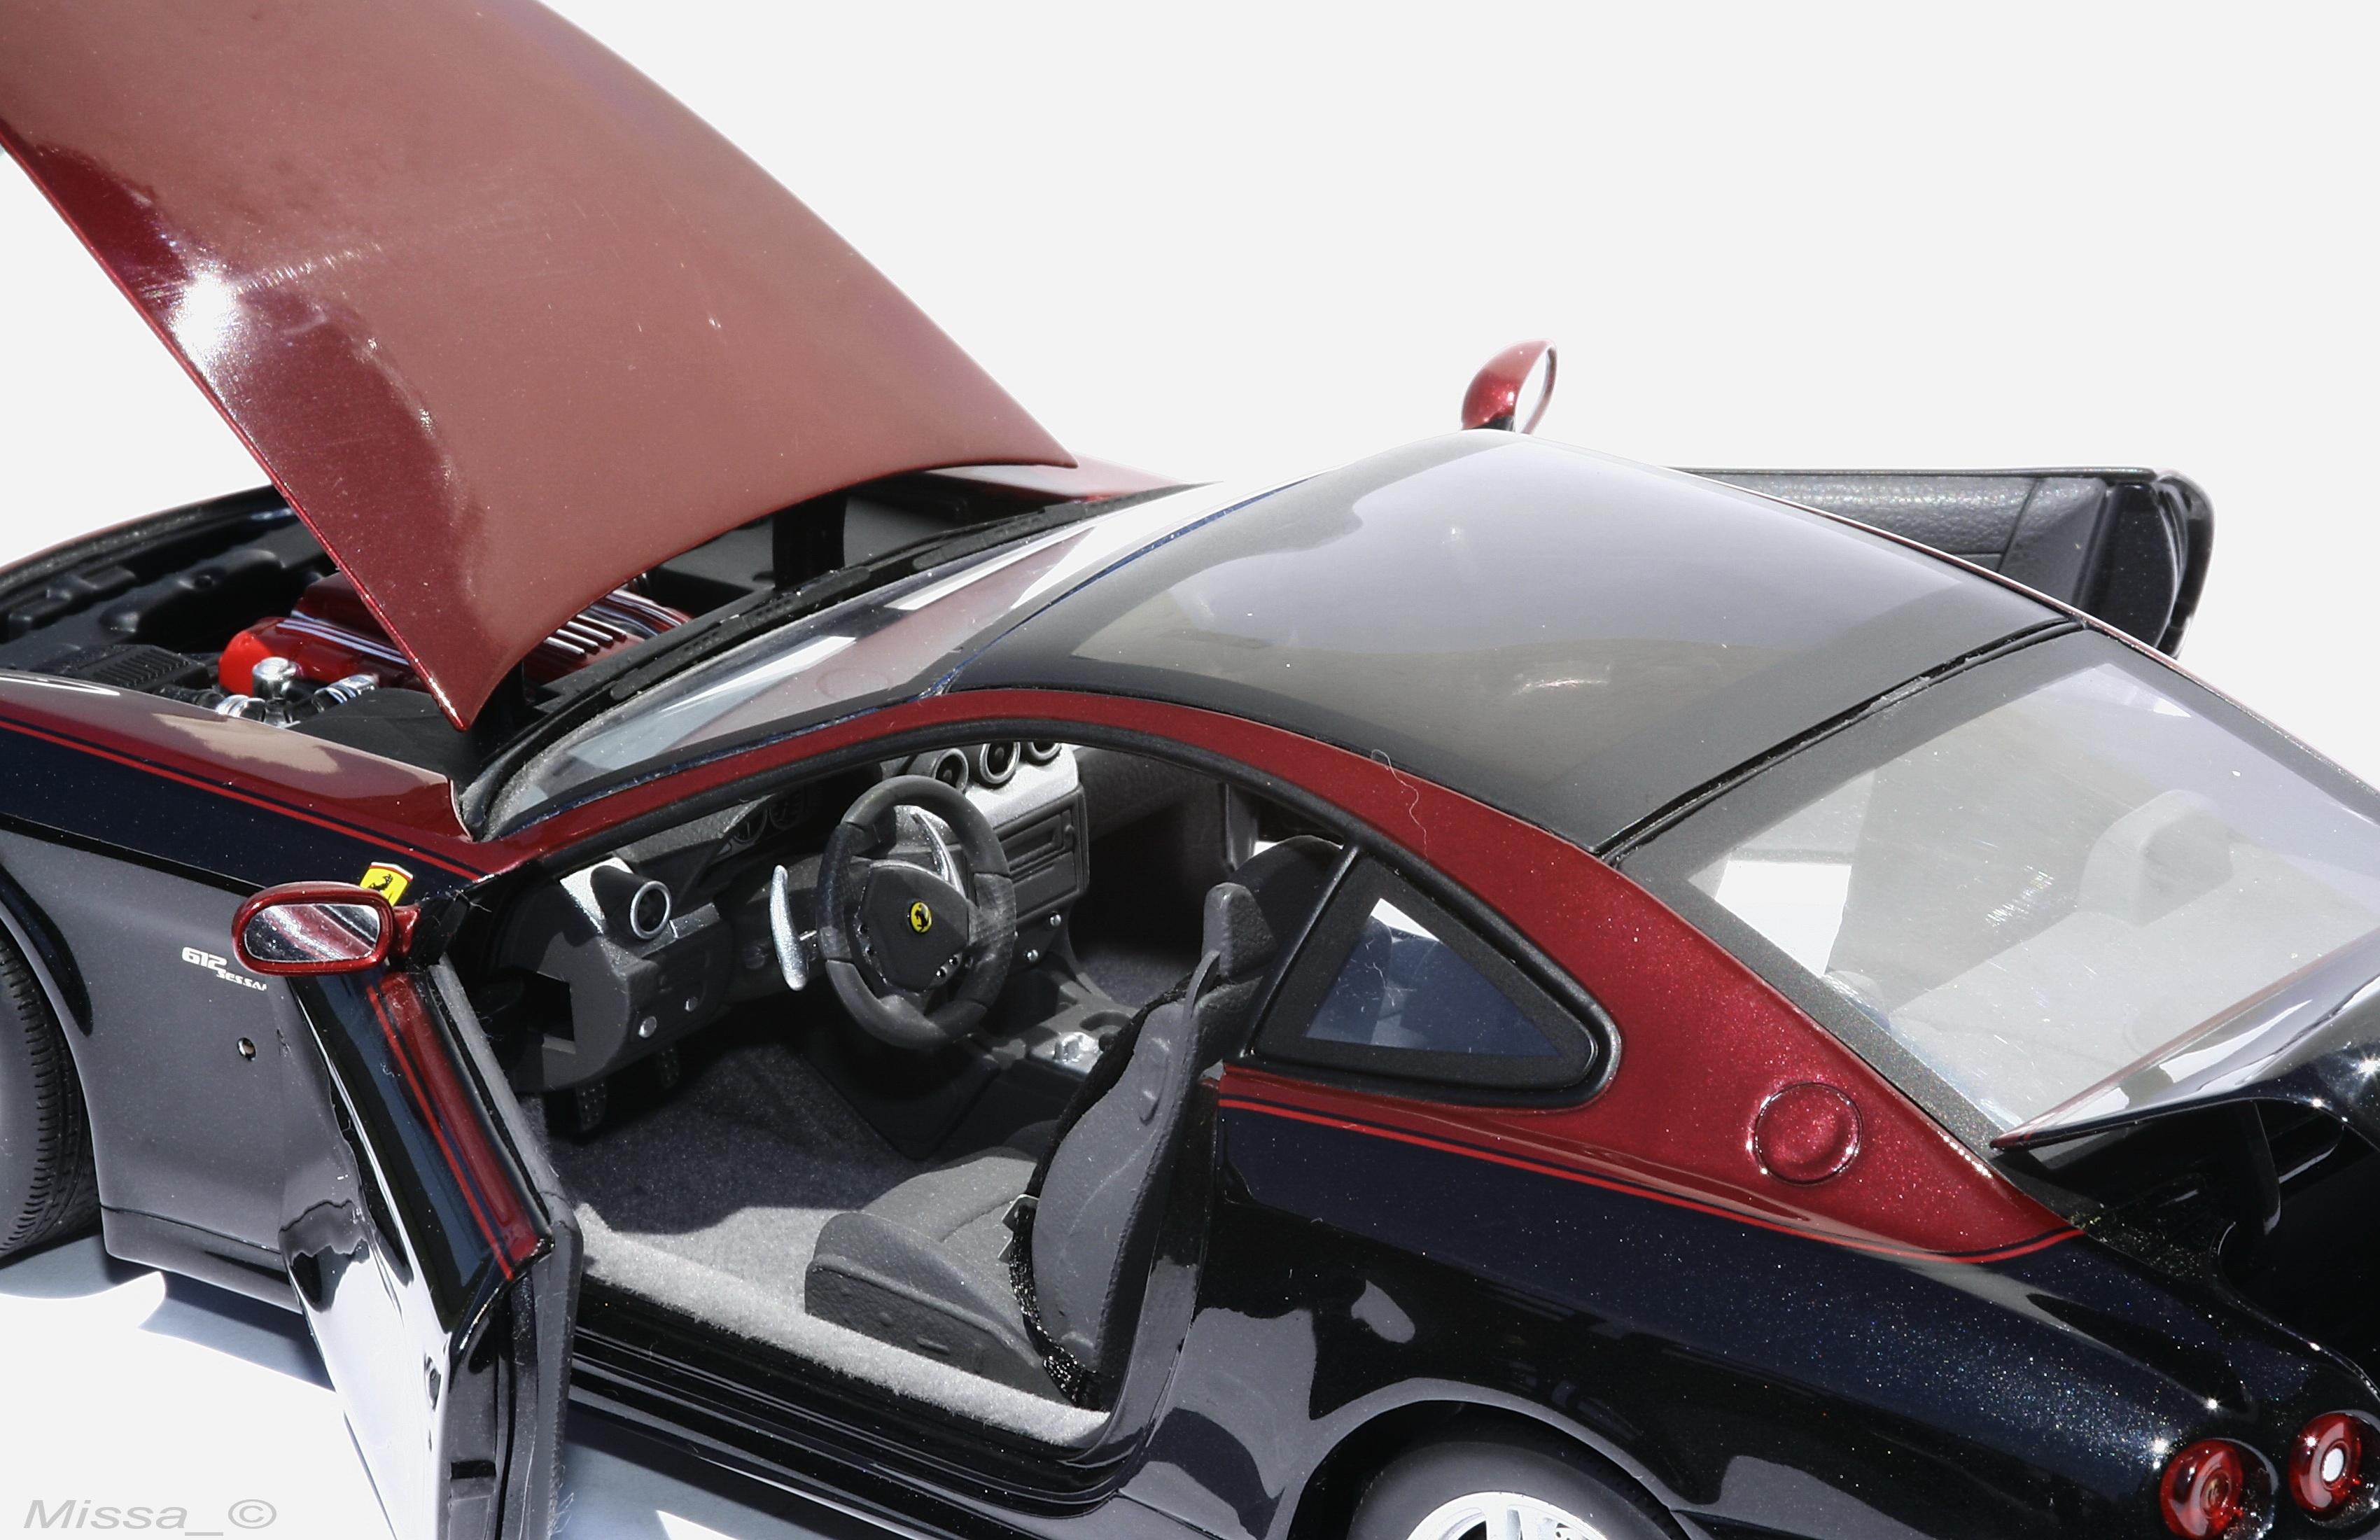 017_elite_ferrari612scfl4m Fabulous Ferrari Mondial 8 Super Elite Cars Trend